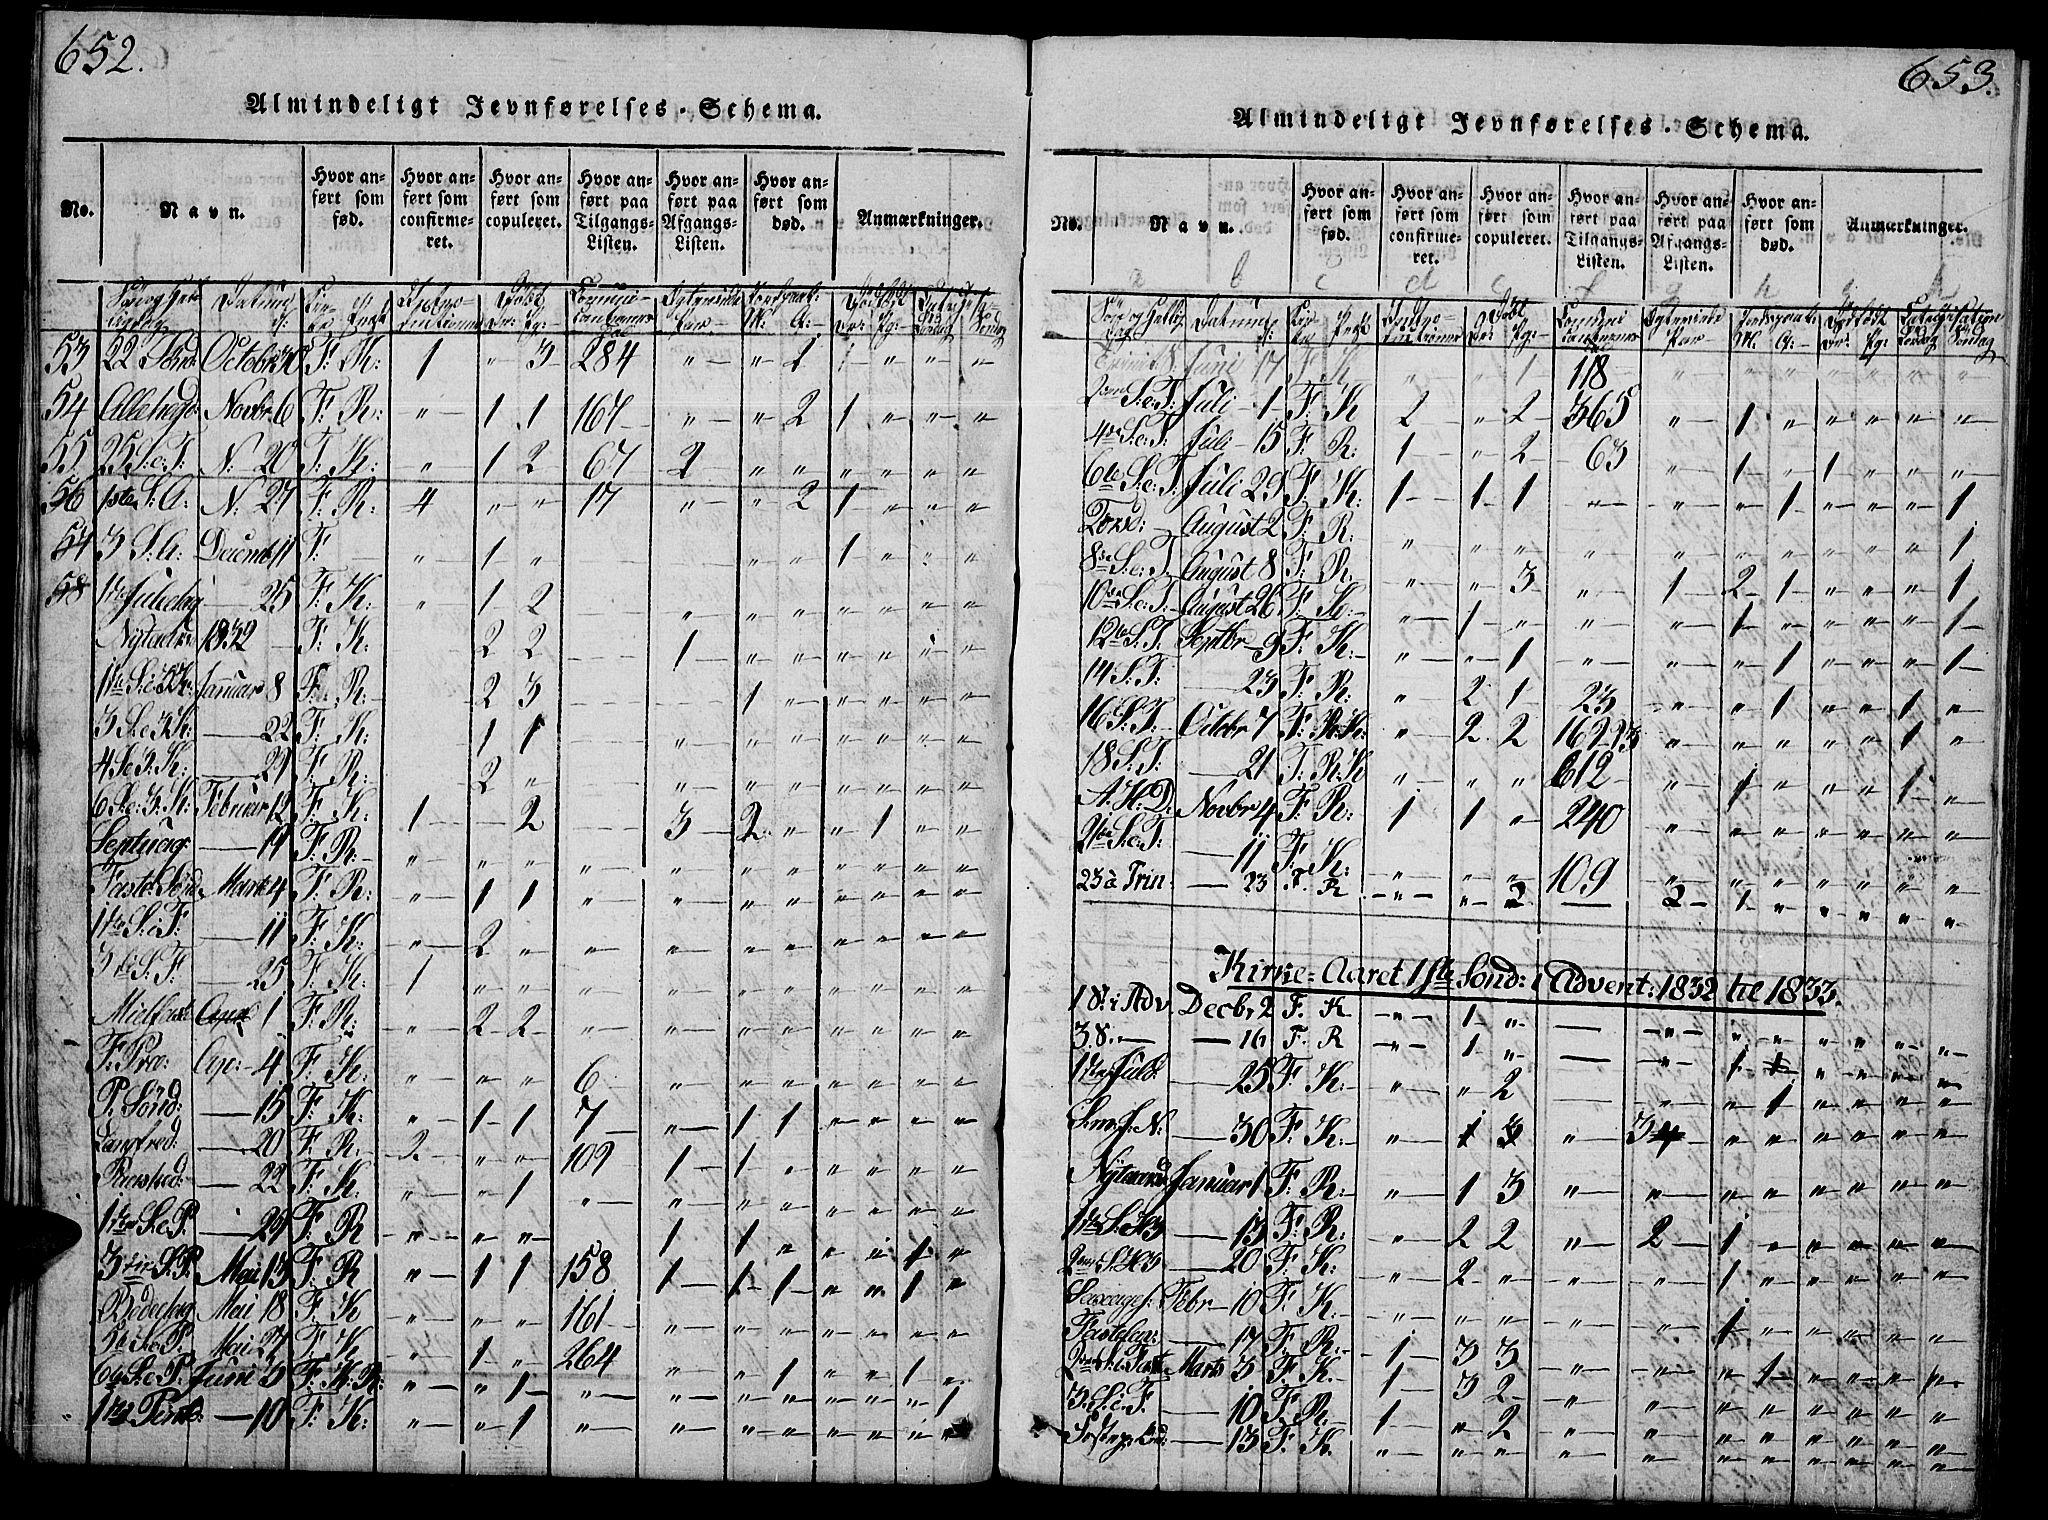 SAH, Fåberg prestekontor, Klokkerbok nr. 4, 1818-1837, s. 652-653